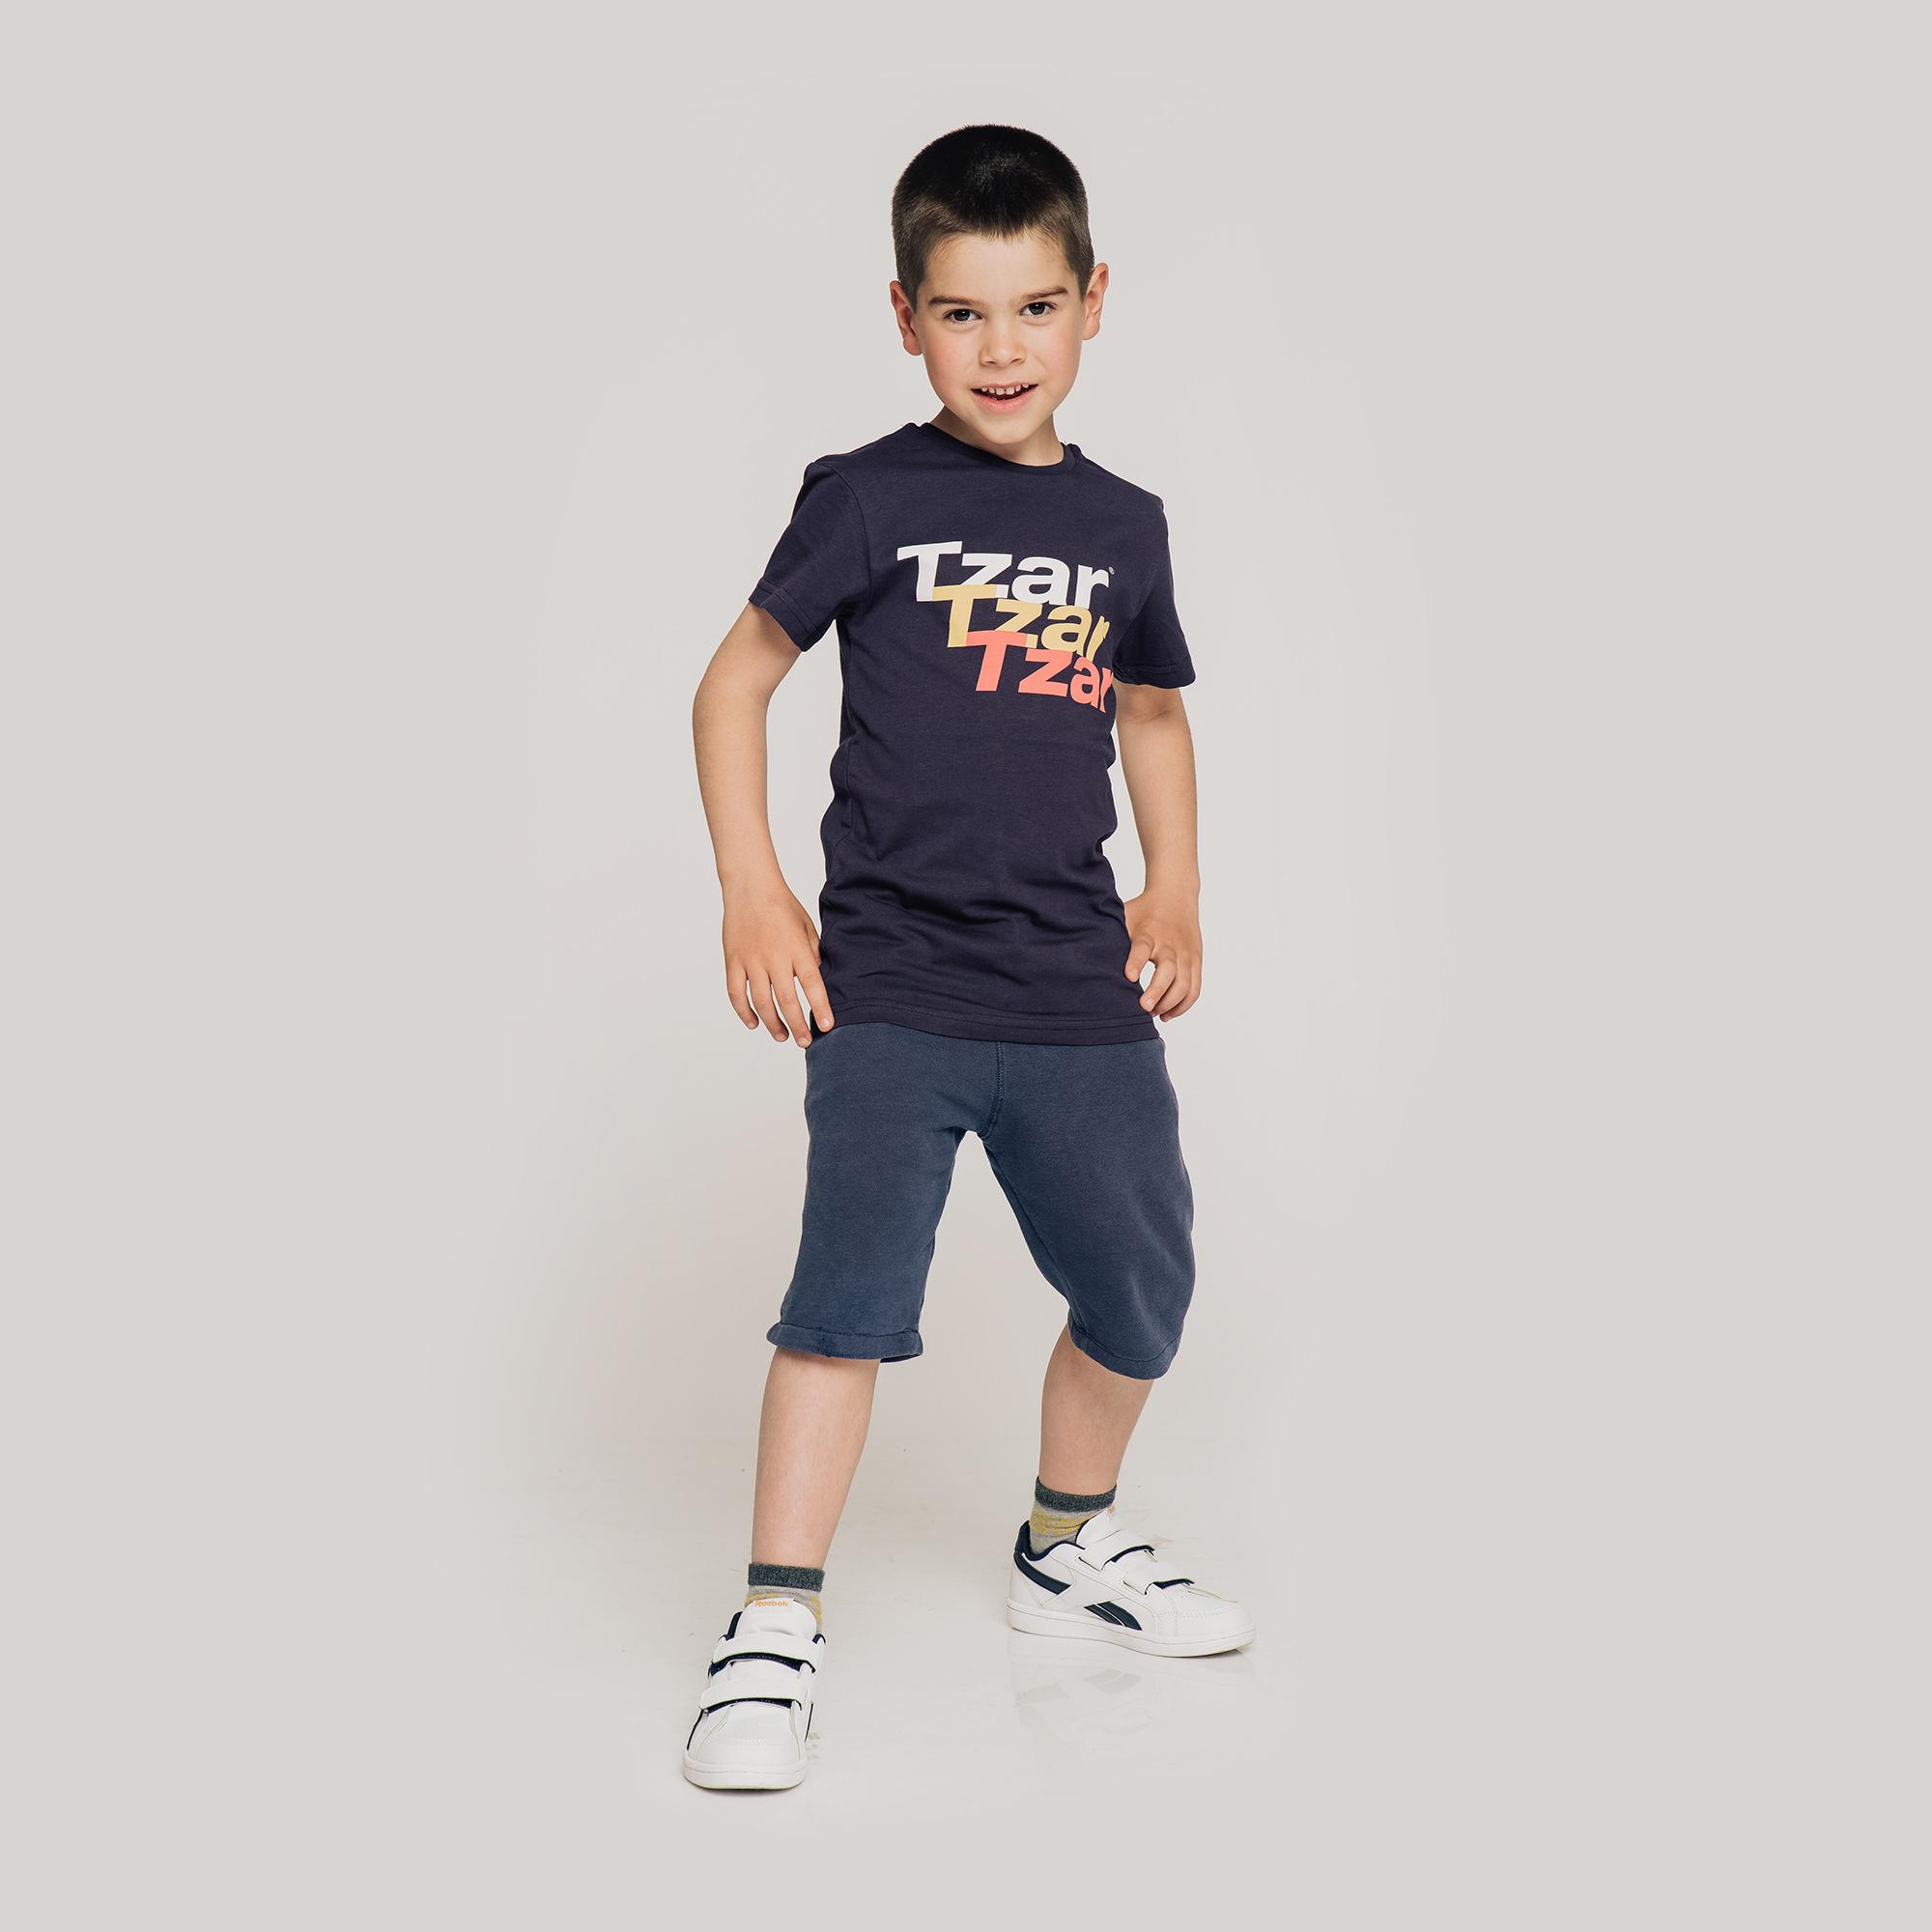 1a3586959 Marvin 2, boys dark purple t-shirt - DechkoTzar